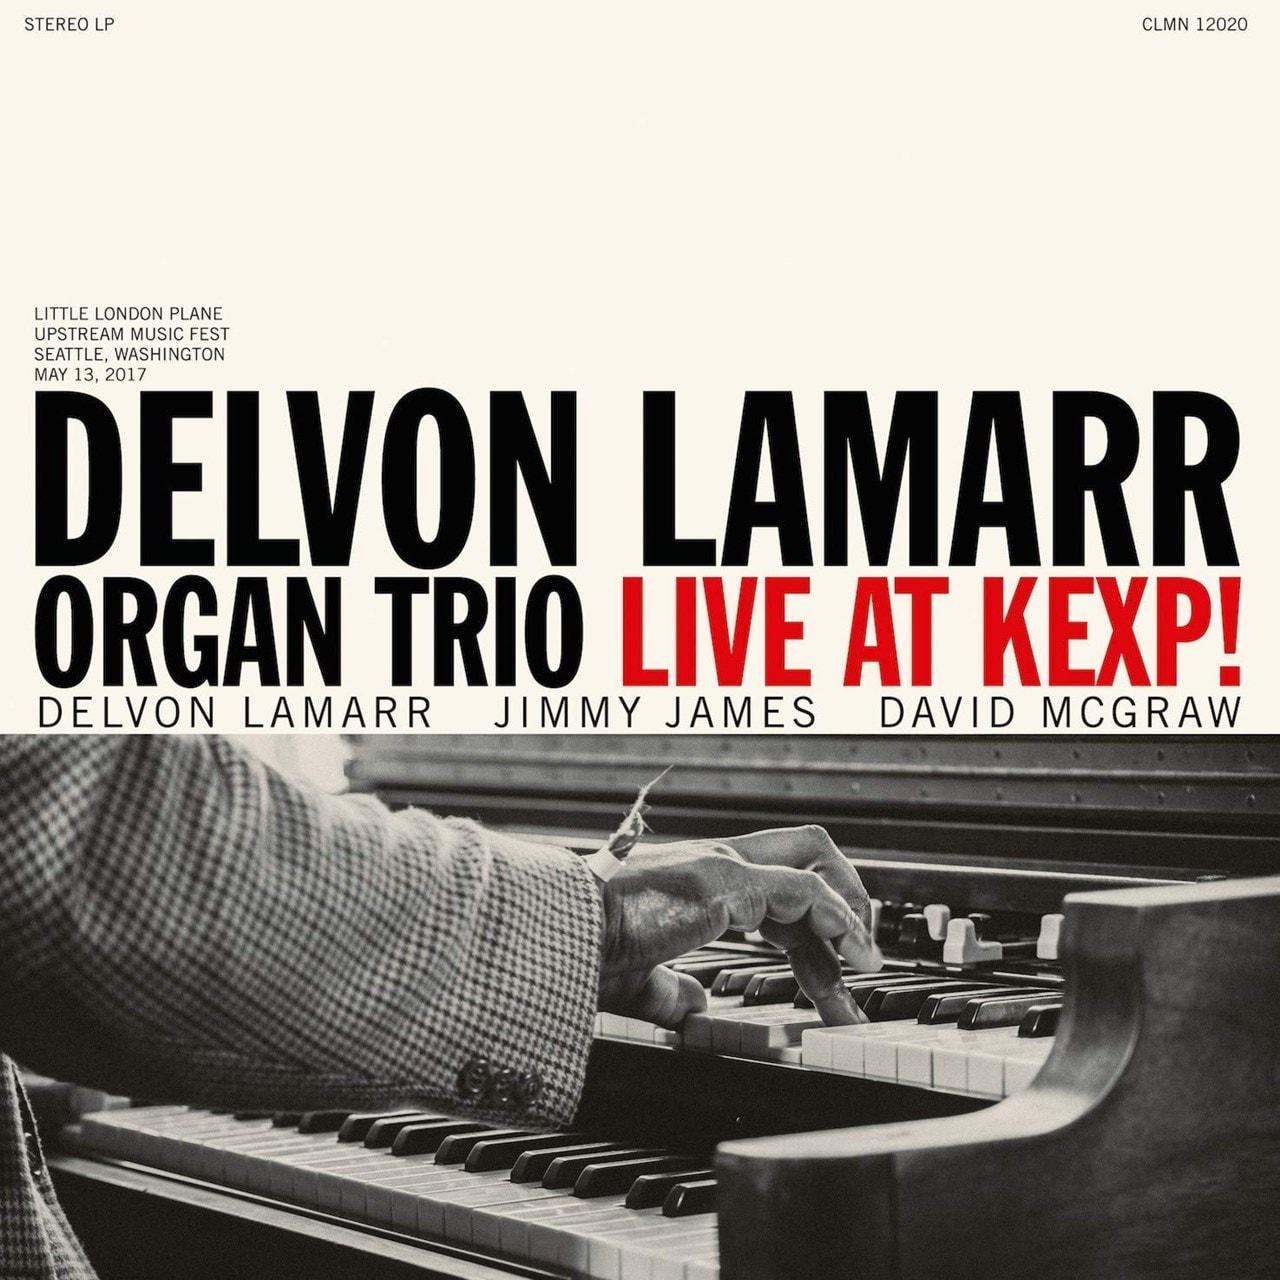 Live at KEXP! - 1